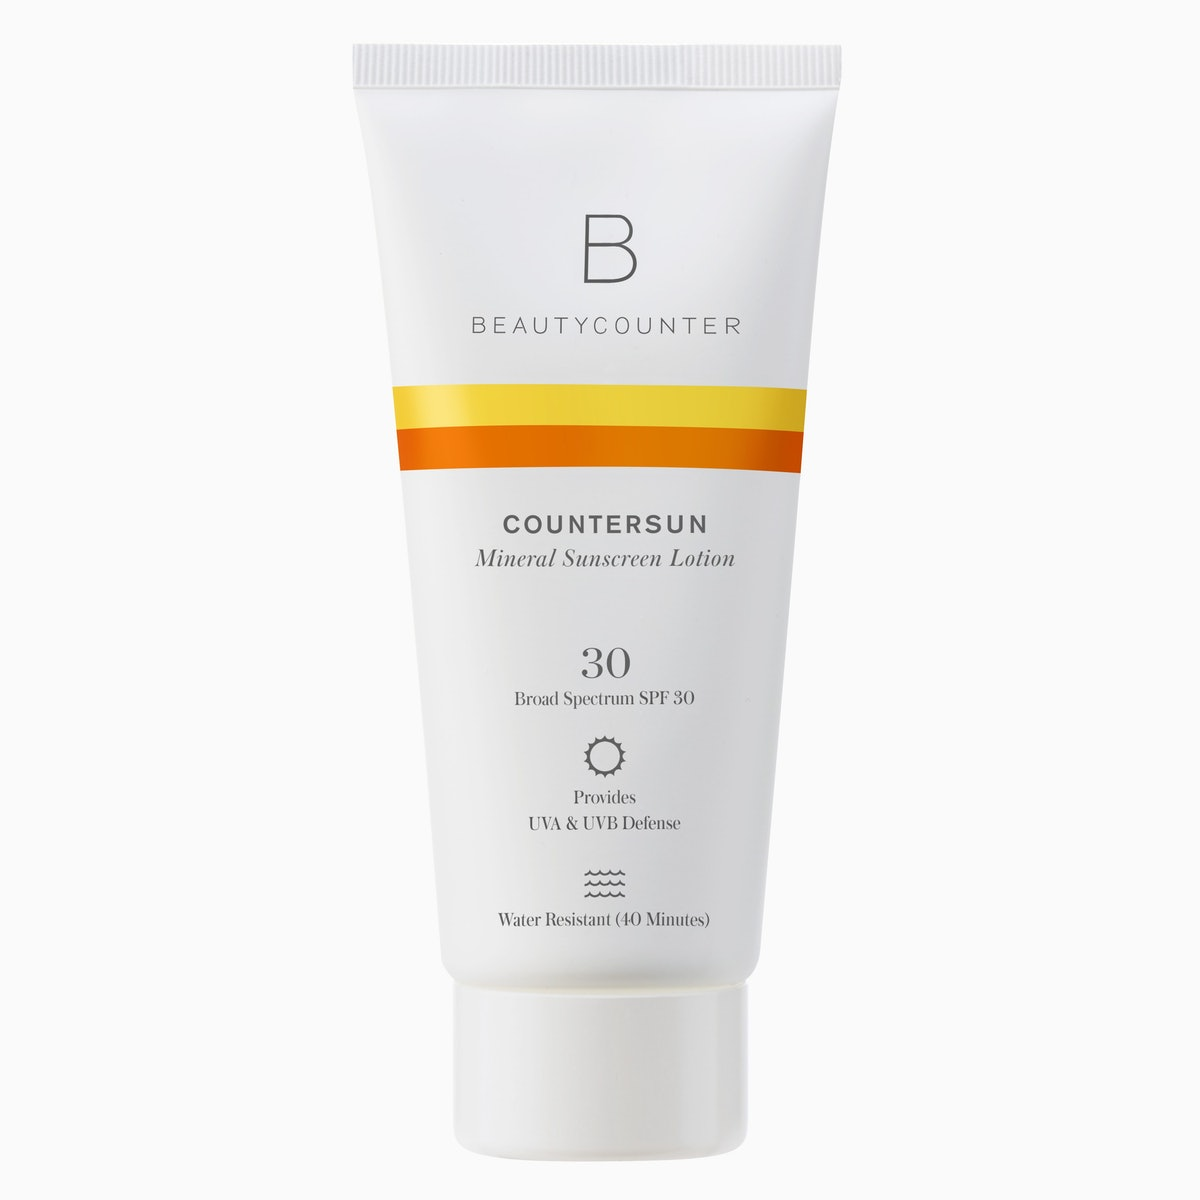 Countersun Mineral Sunscreen Lotion SPF